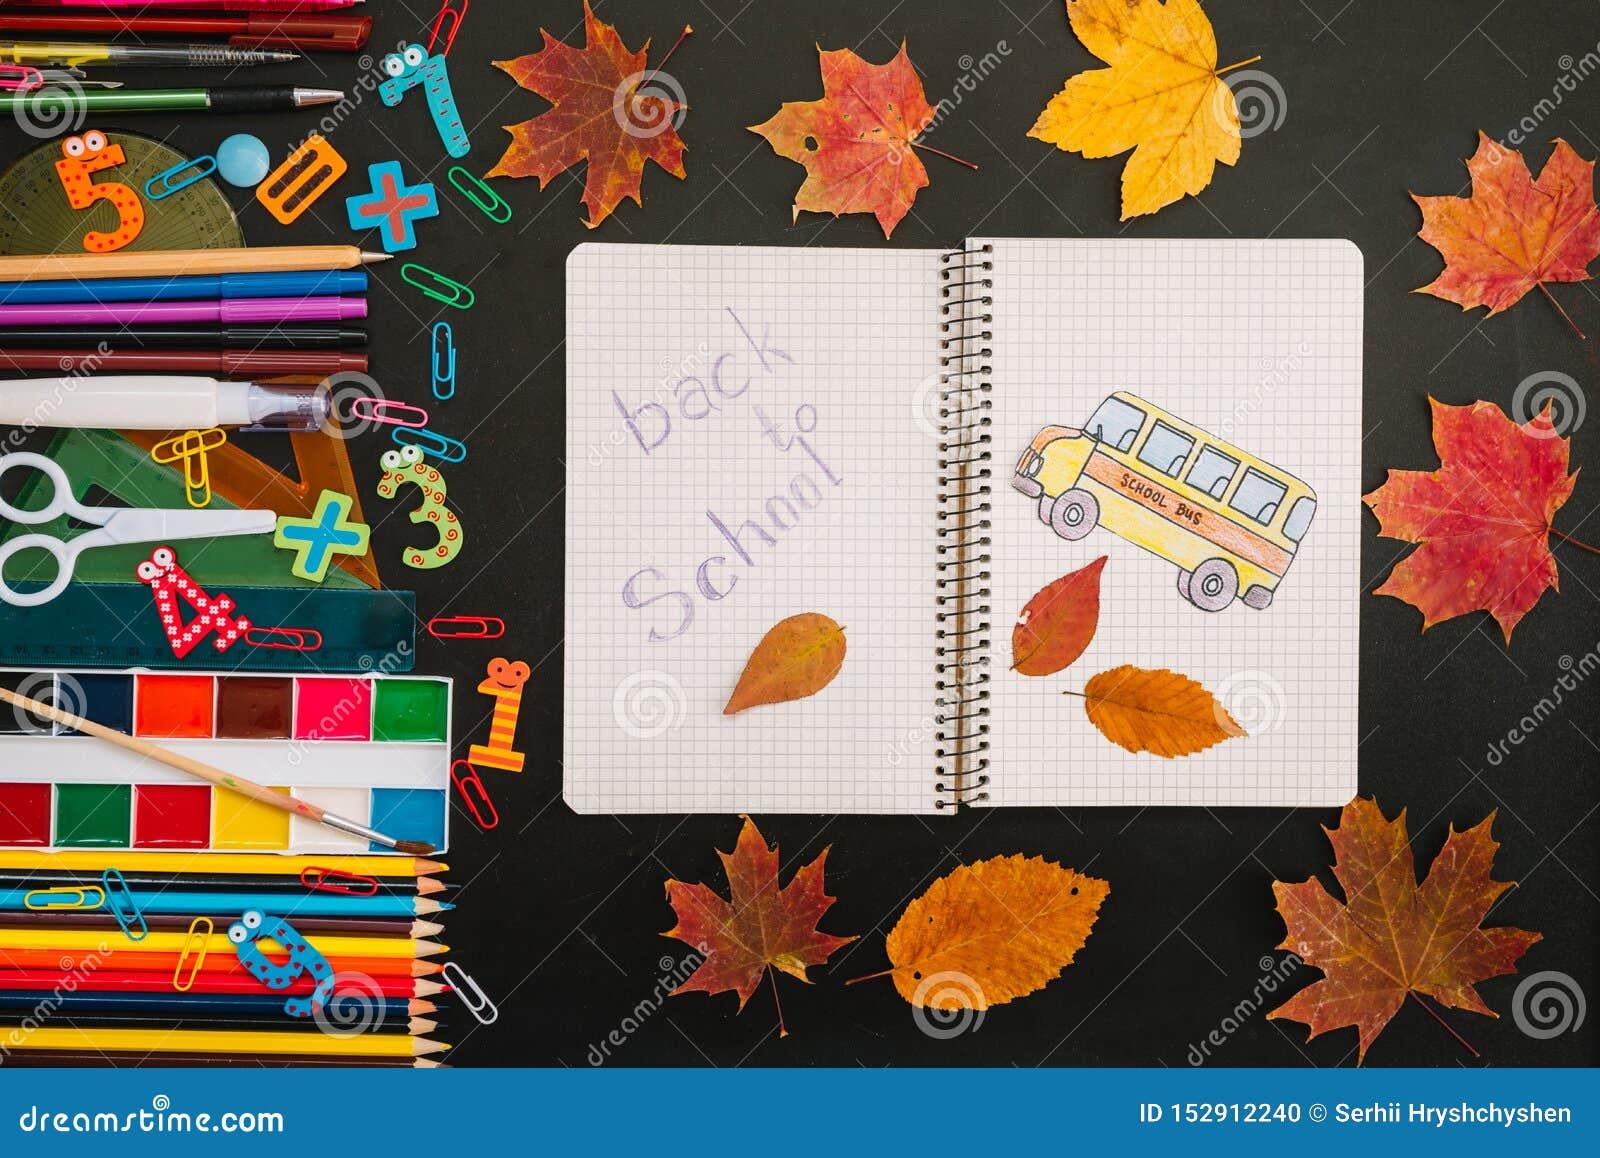 De volta ao conceito da escola Escola e materiais de escrit?rio no fundo do quadro-negro